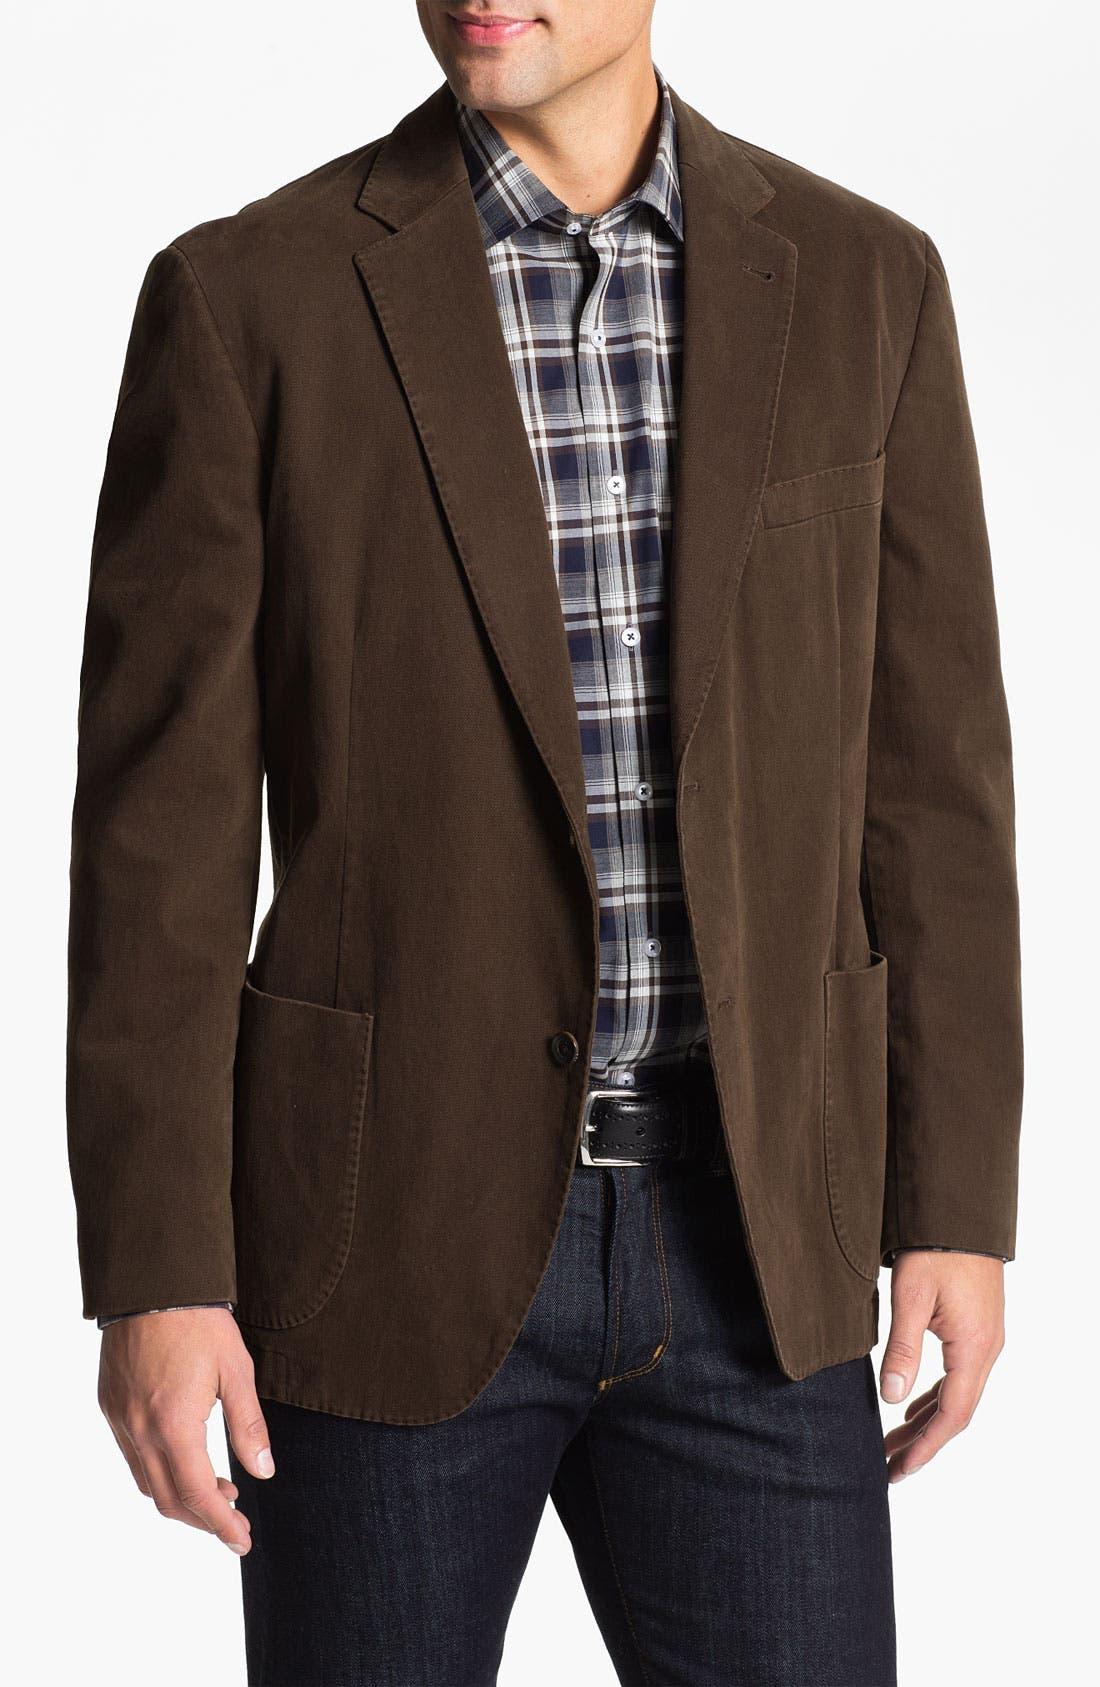 Alternate Image 1 Selected - Kroon Brushed Cotton Sportcoat